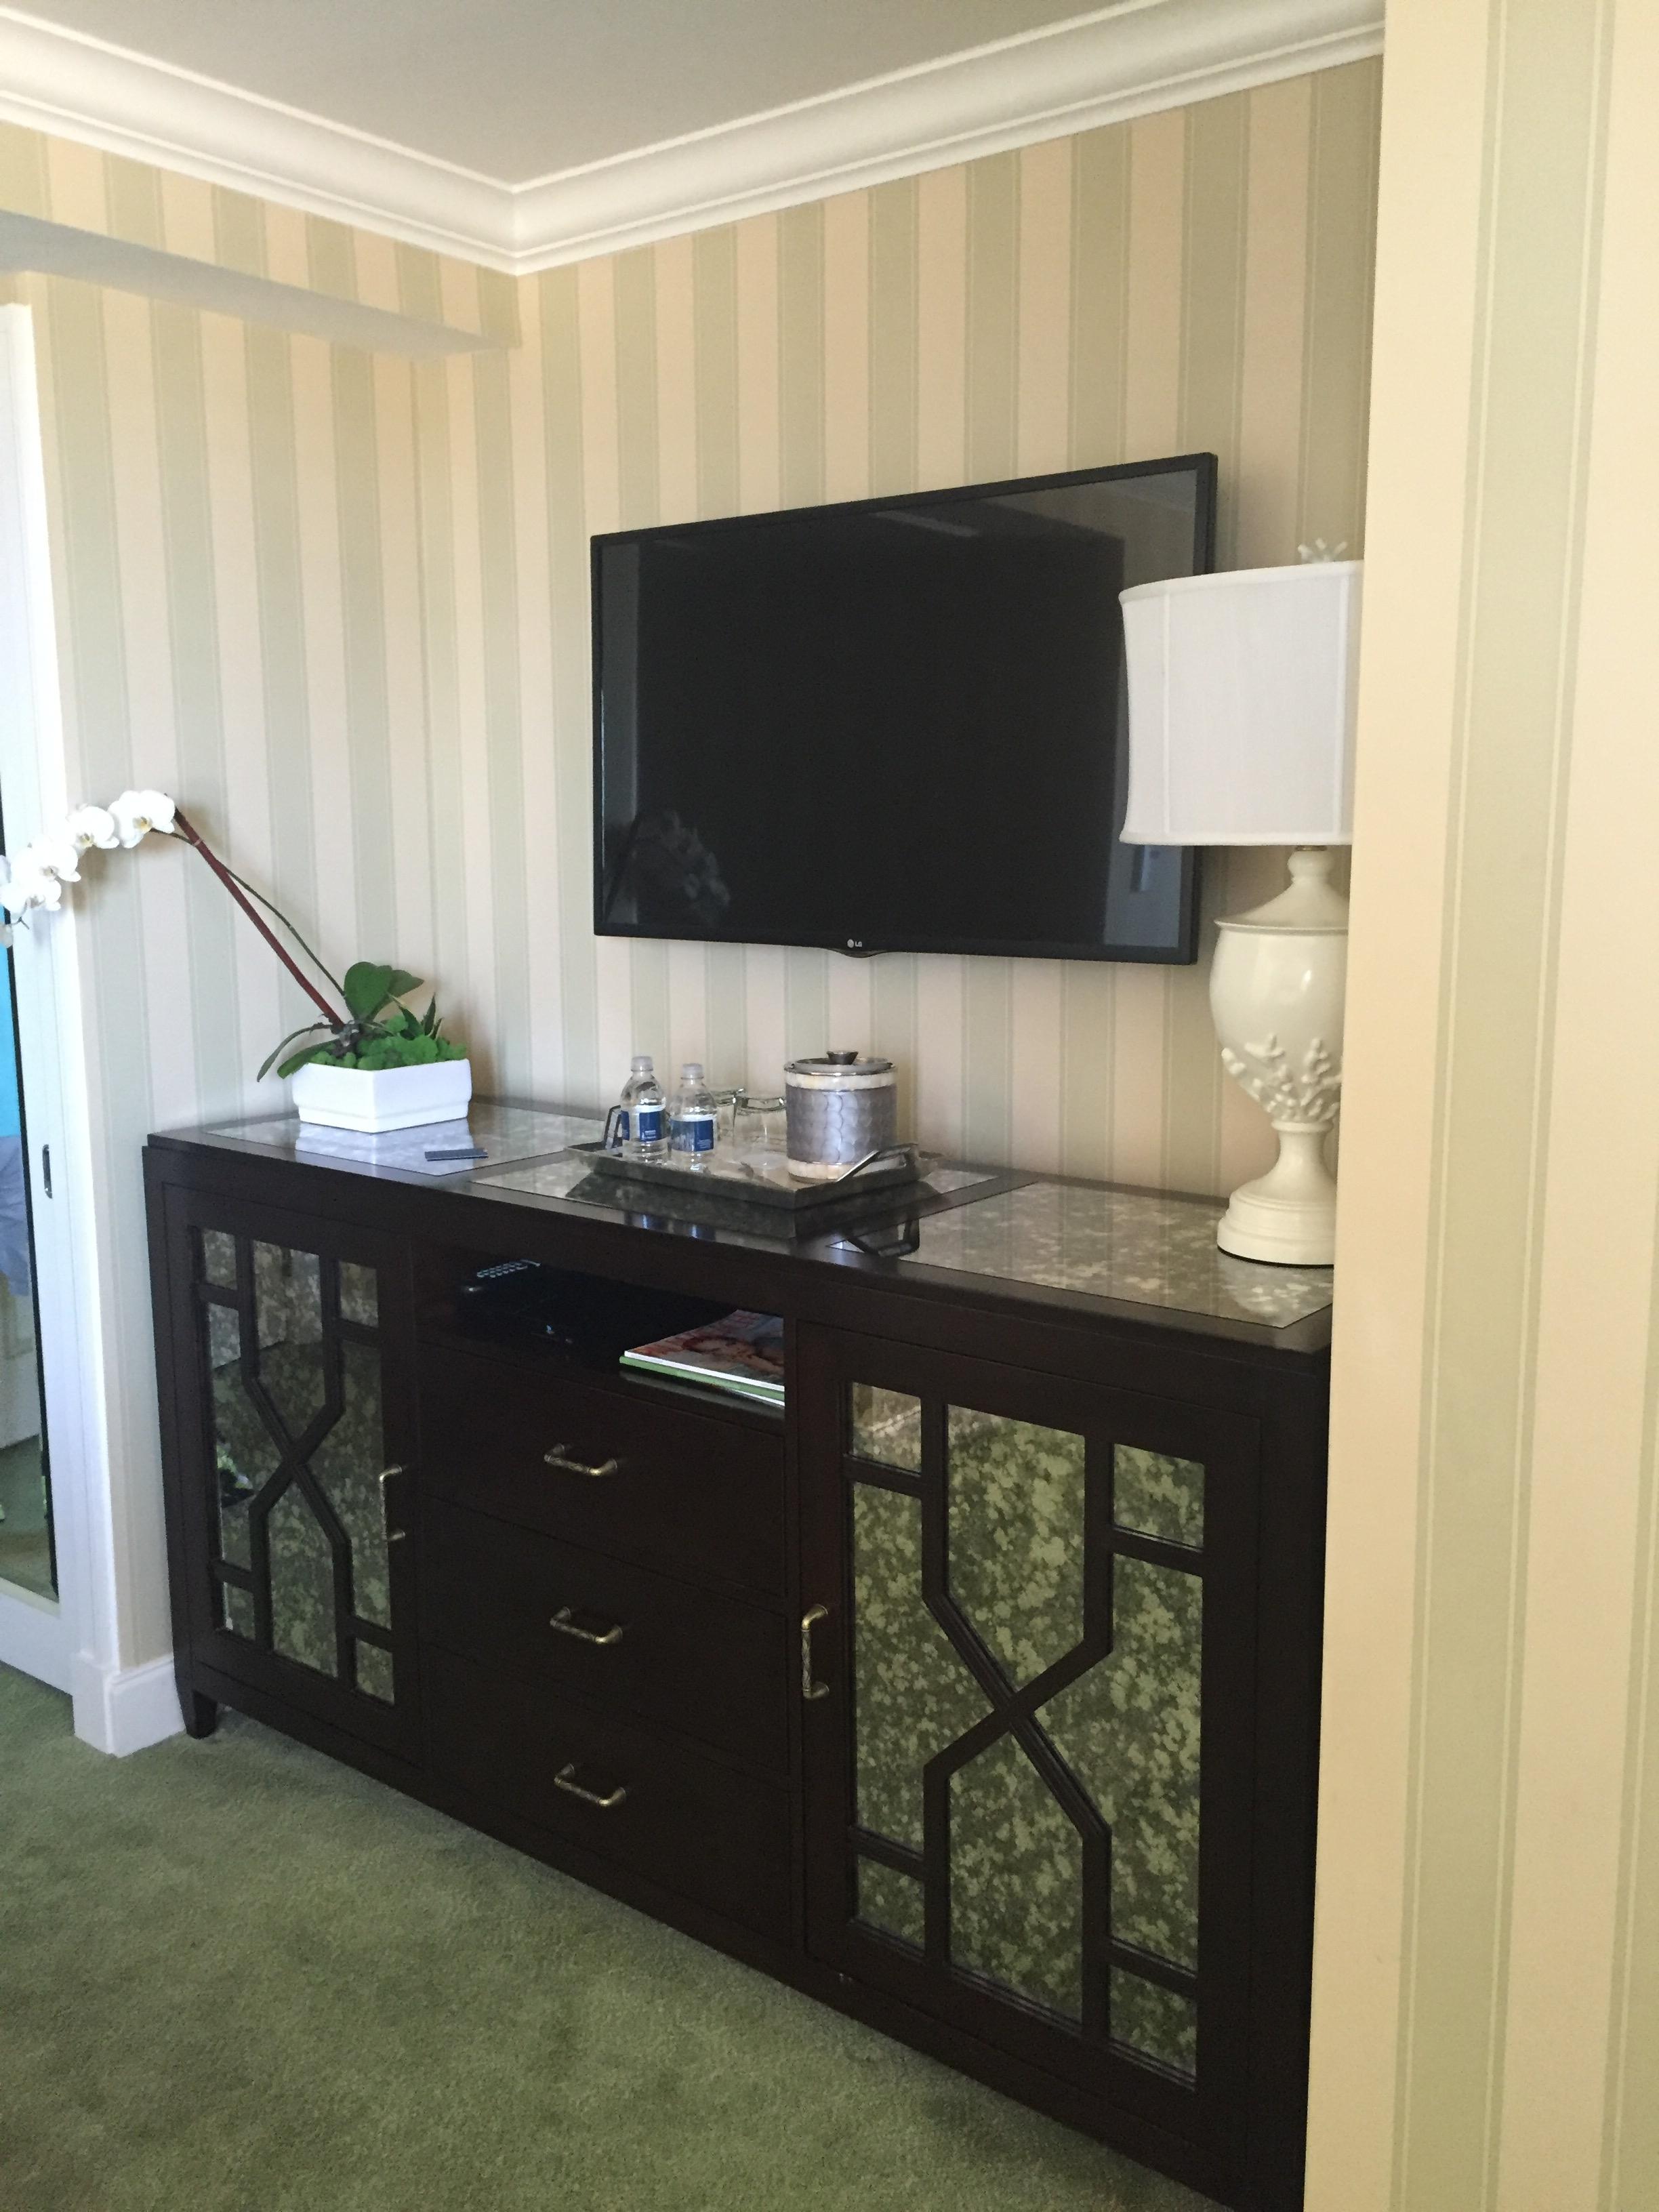 thebreakers-review-kingsize-hotel-room.jpg